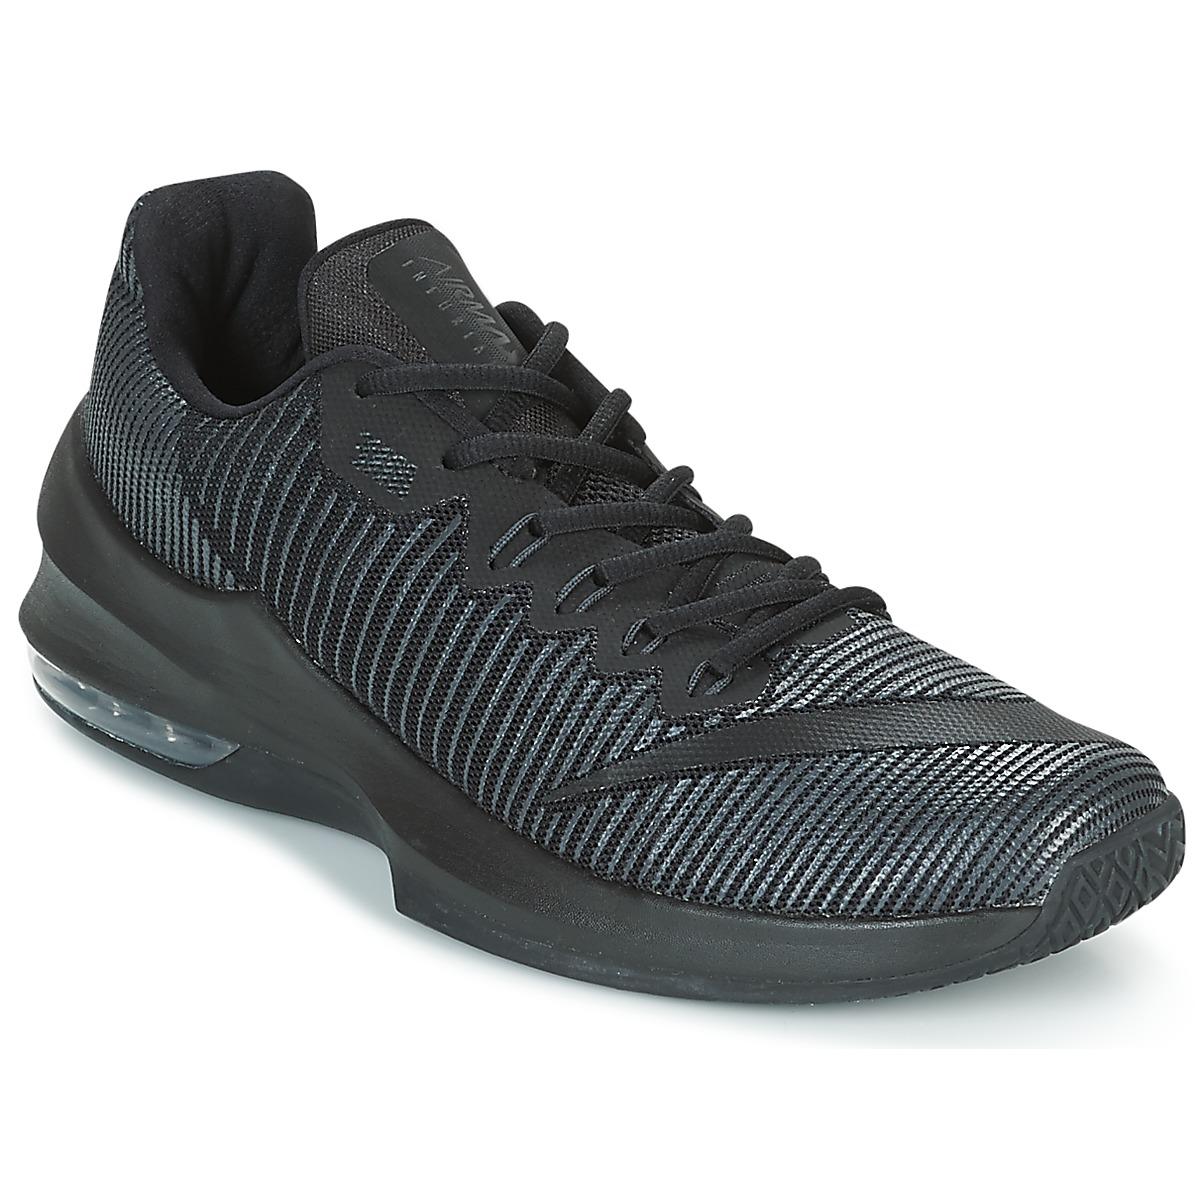 Nike AIR MAX INFURIATE 2 LOW Schwarz - Kostenloser Versand bei Spartoode ! - Schuhe Basketballschuhe Herren 55,99 €